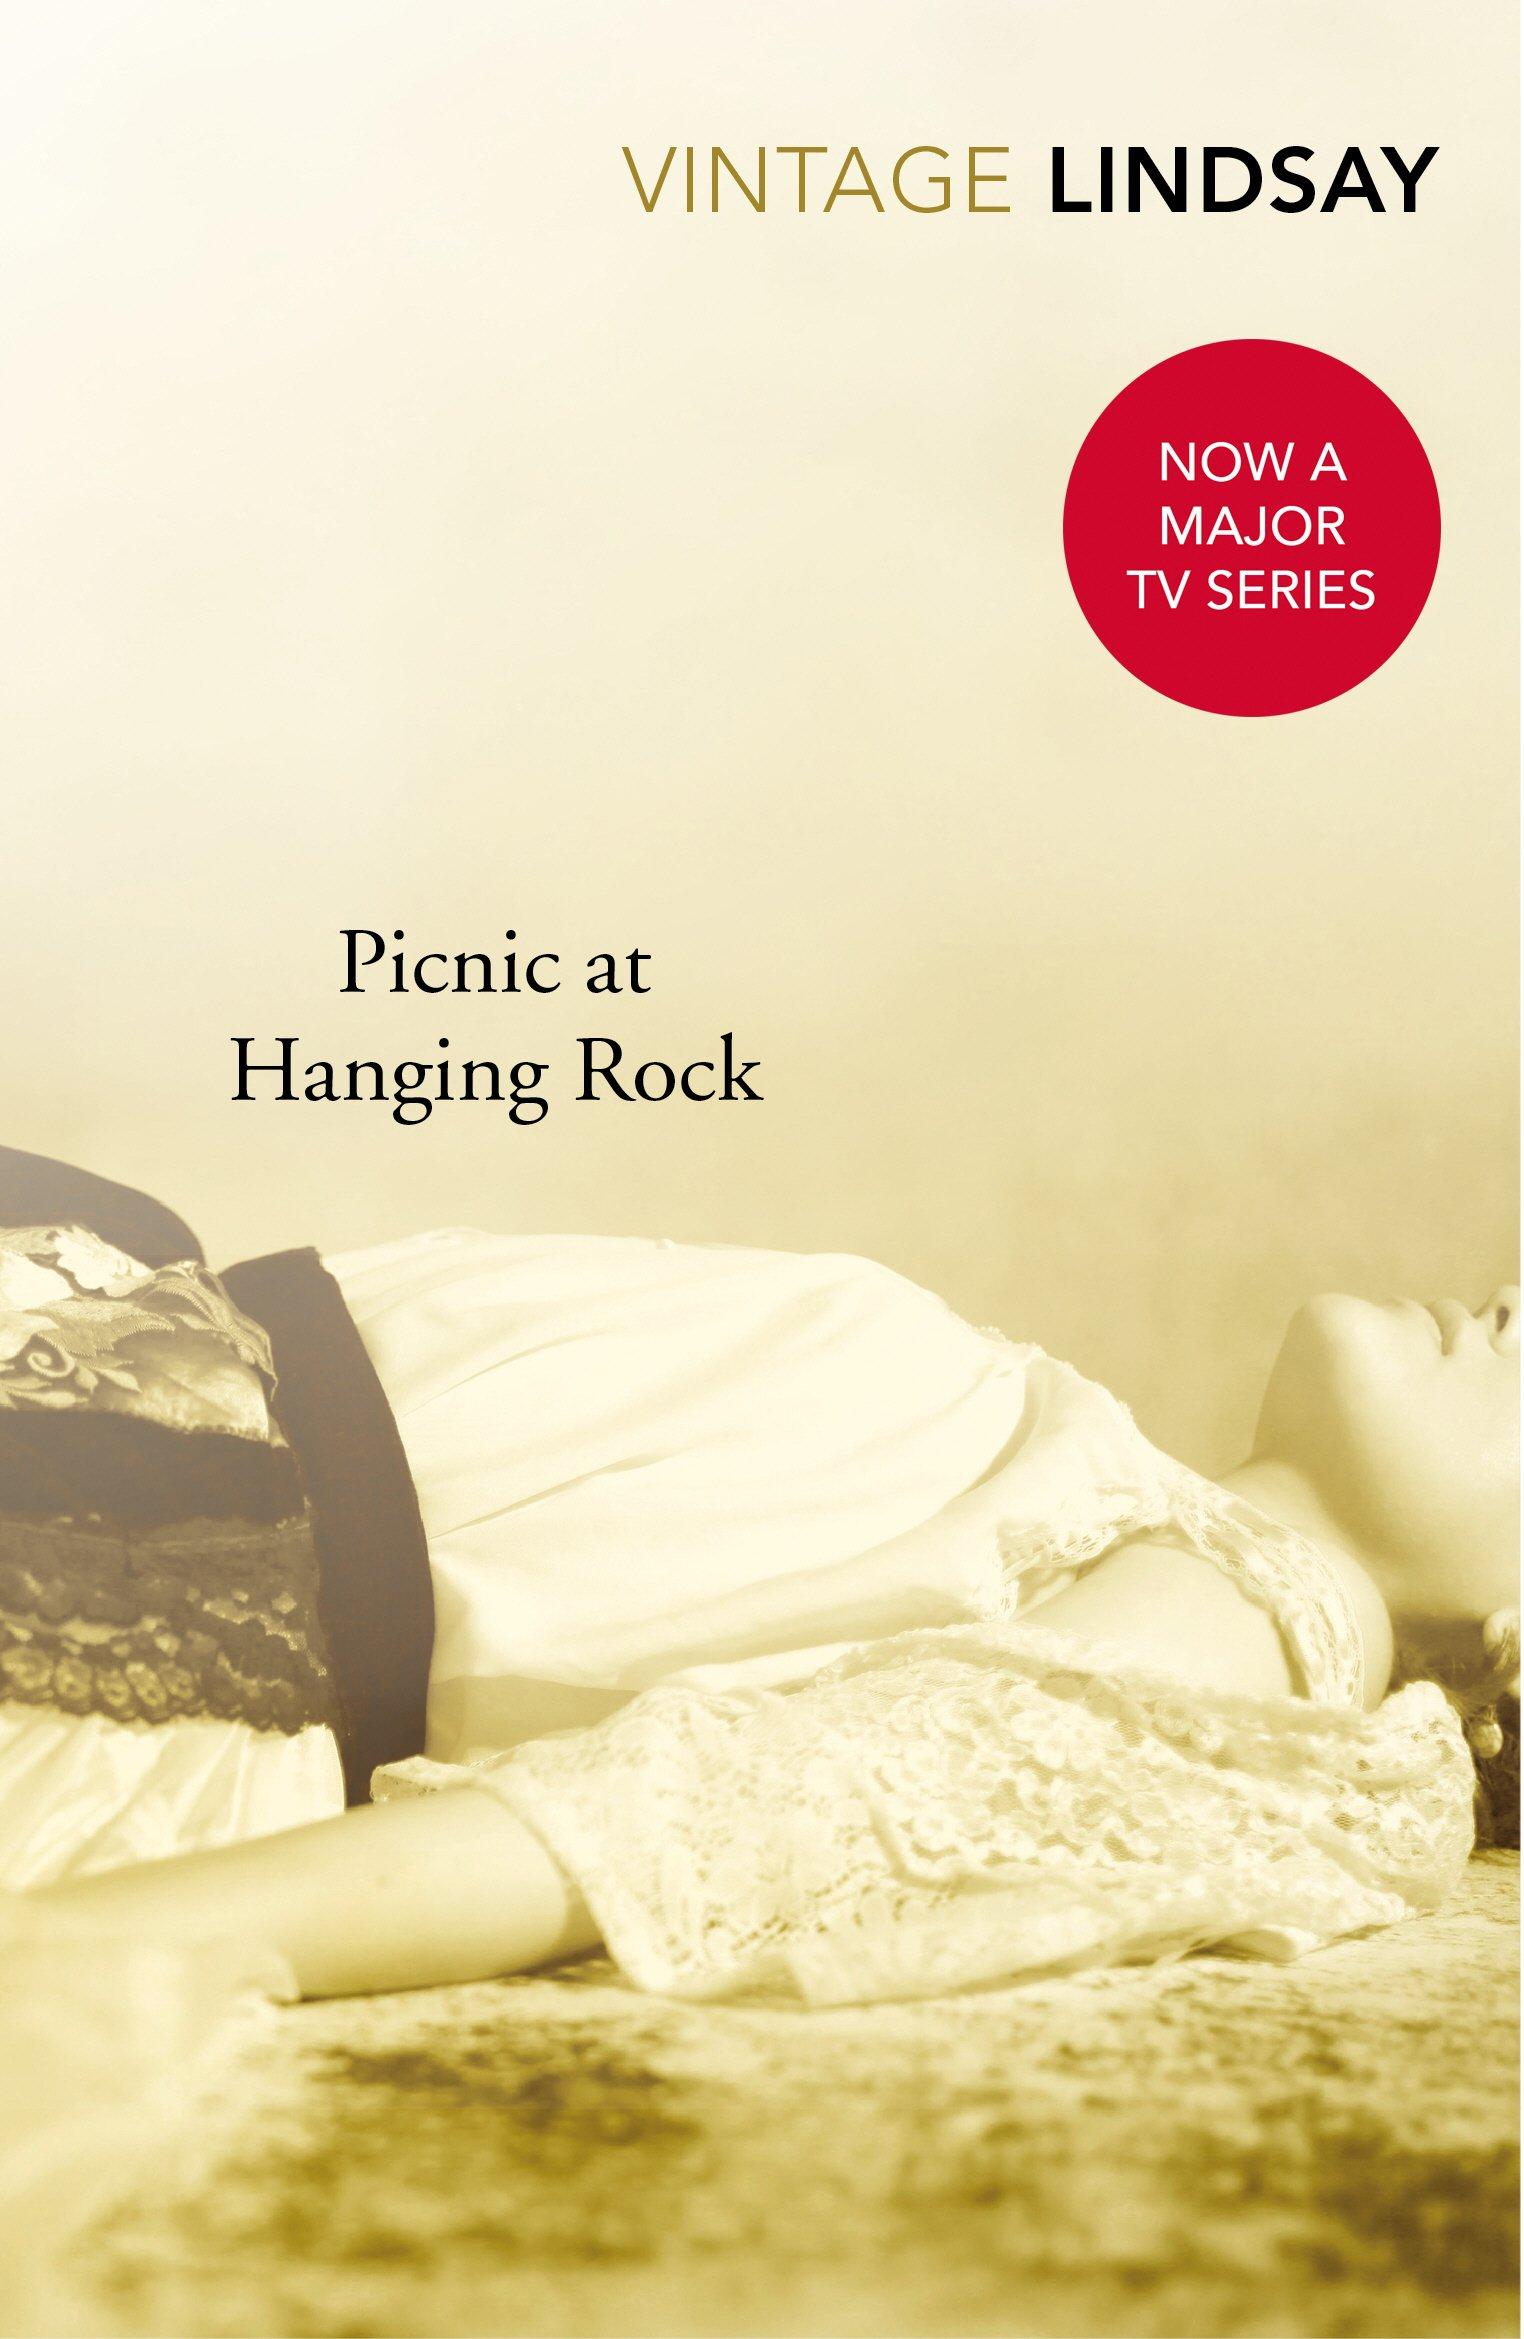 Picnic at Hanging Rock (Vintage Lindsay)